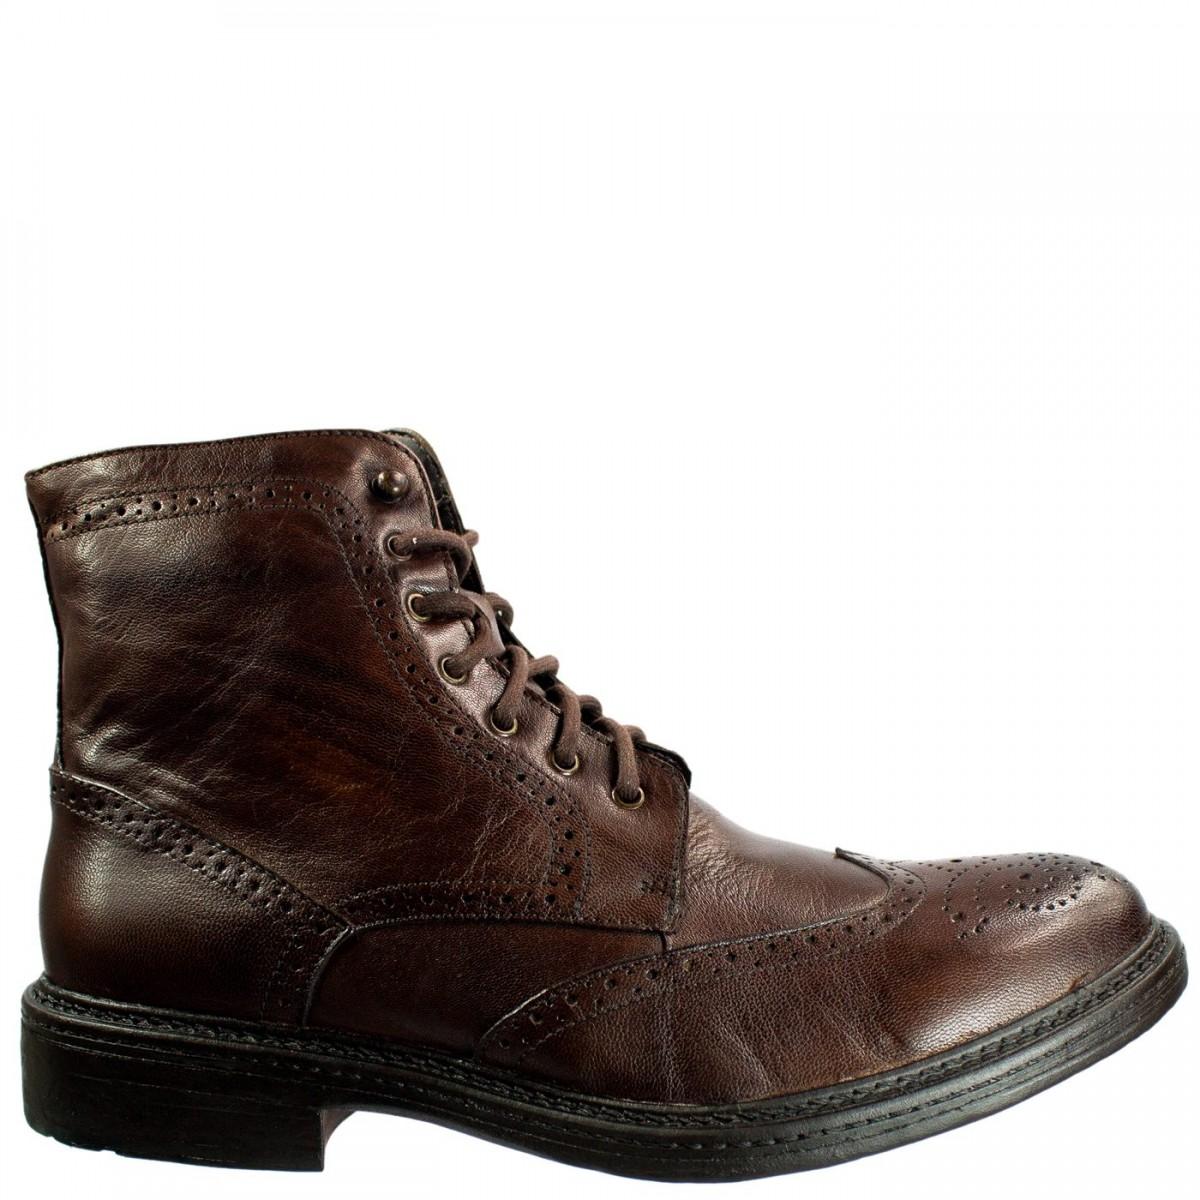 Bizz Store - Bota Masculina Democrata Holder Country Couro b13030f79de